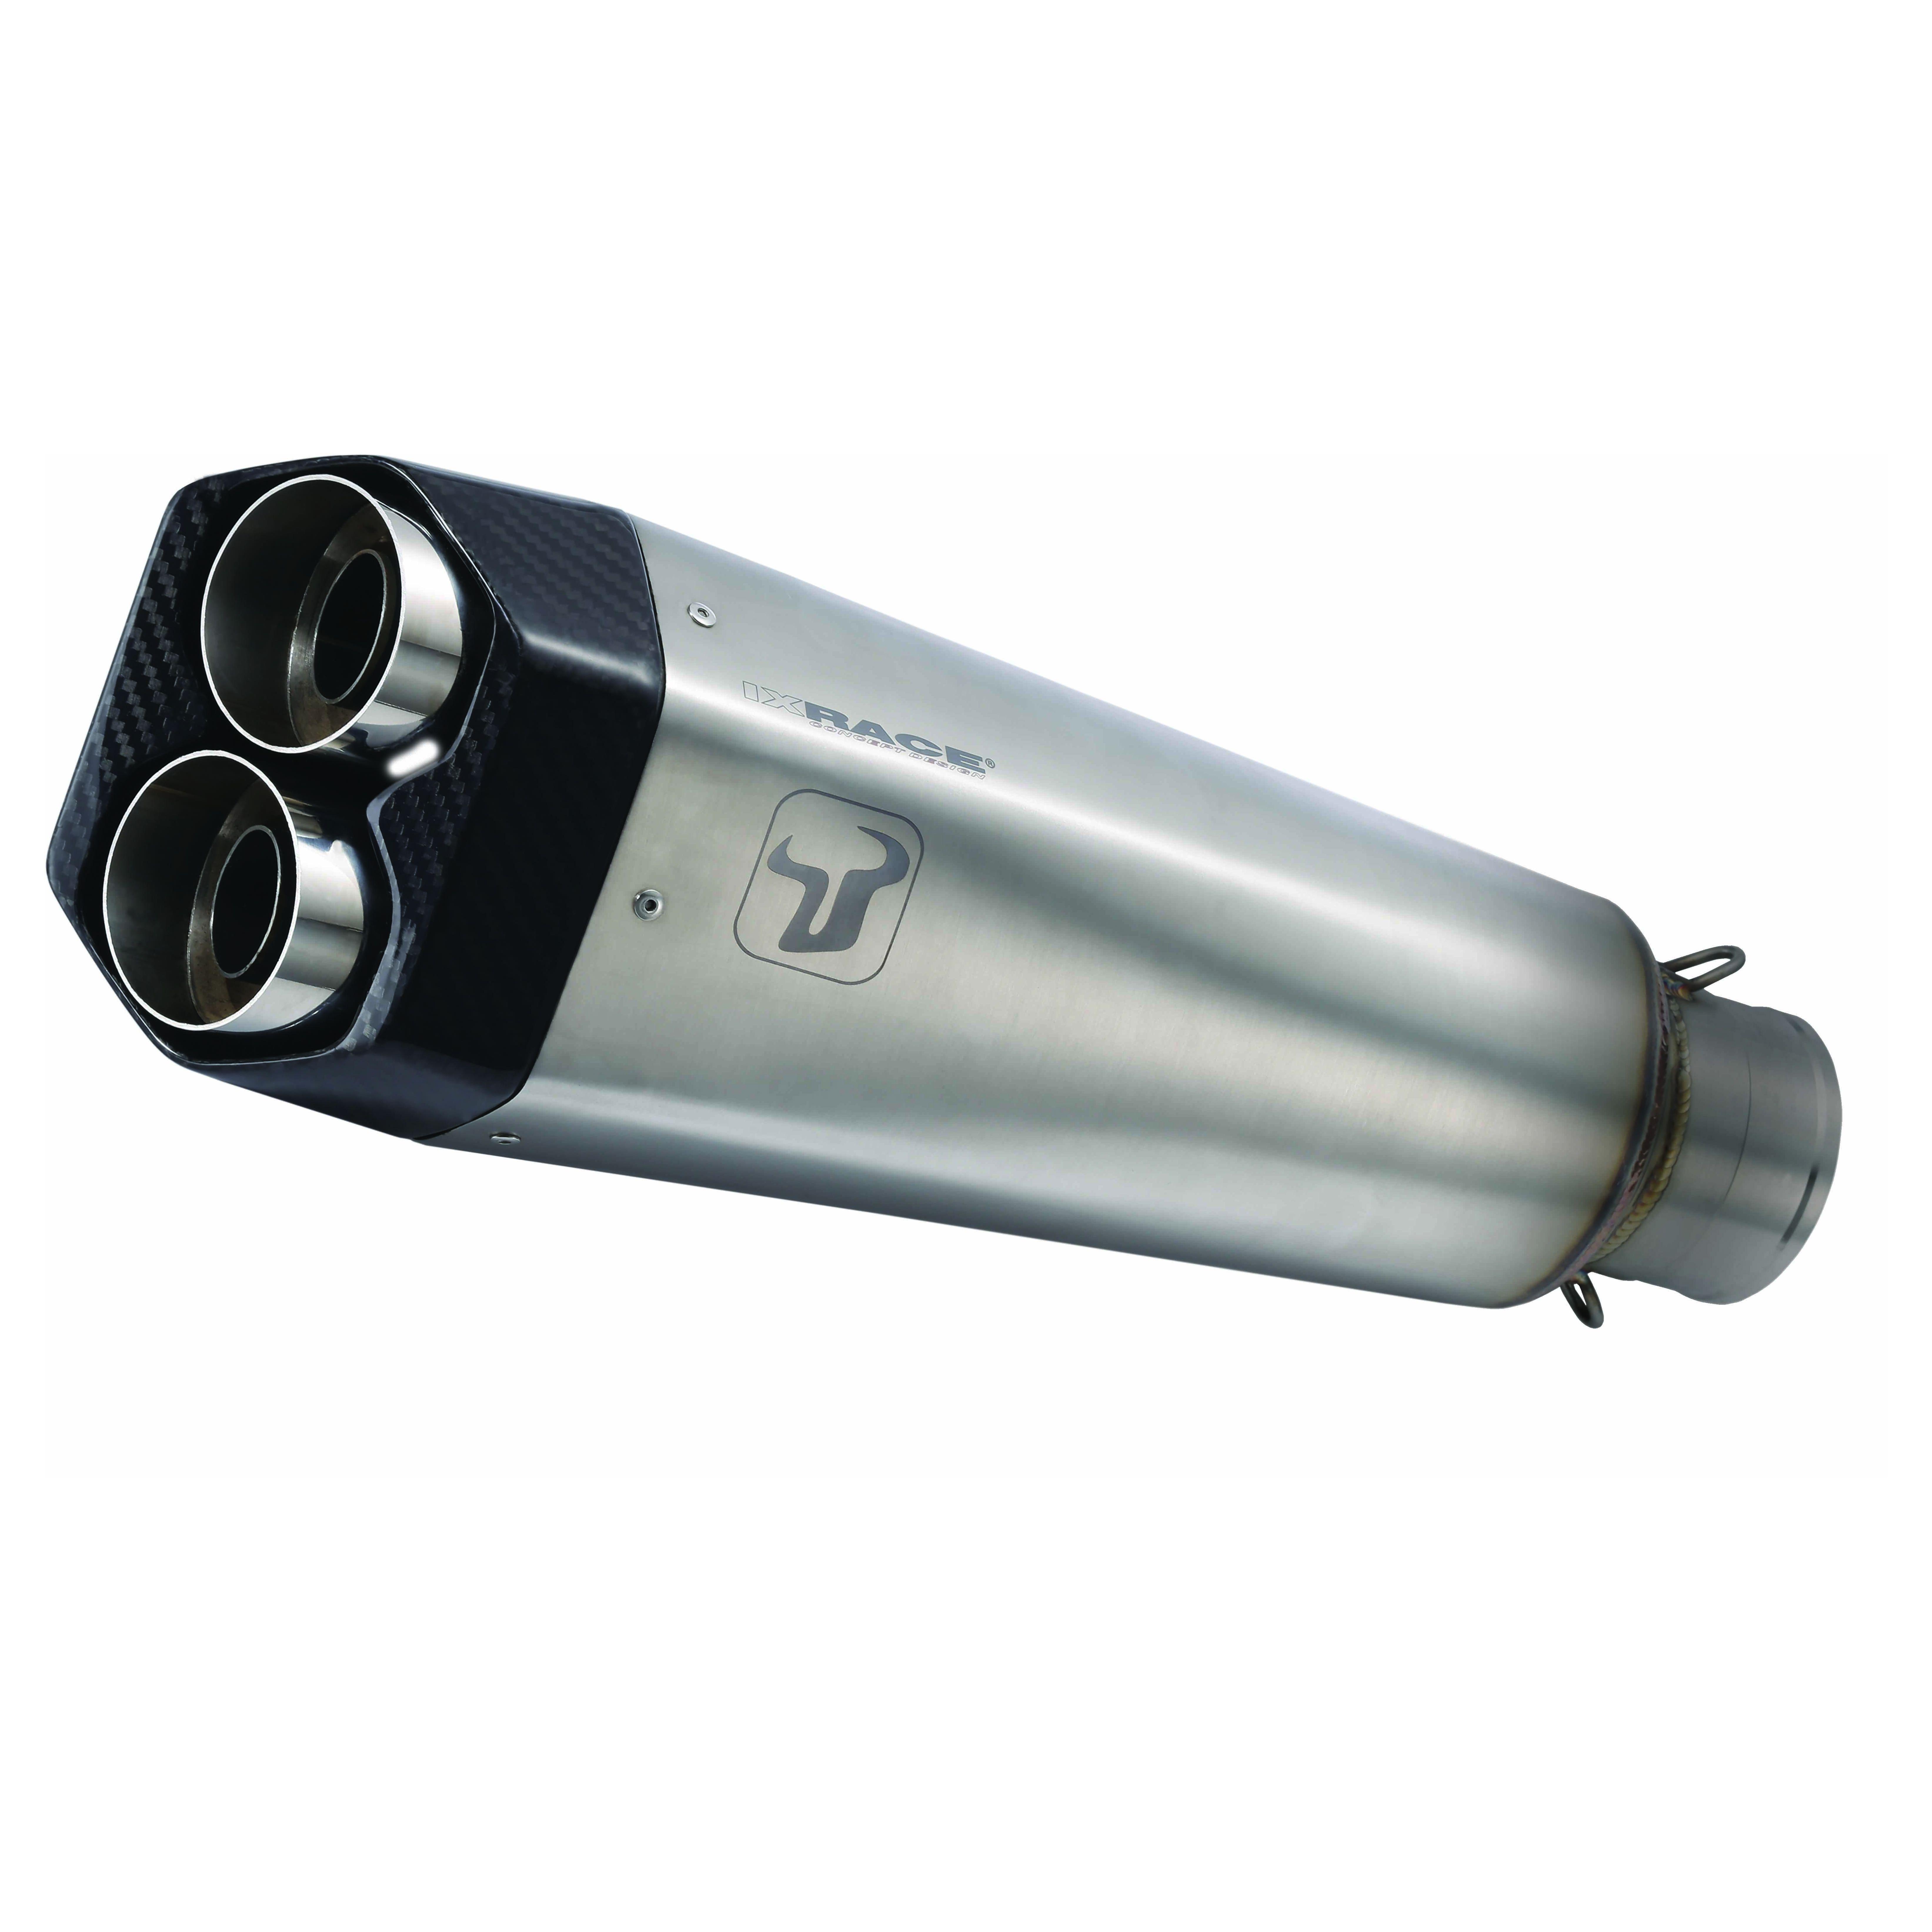 Silencieux Ixrace M9